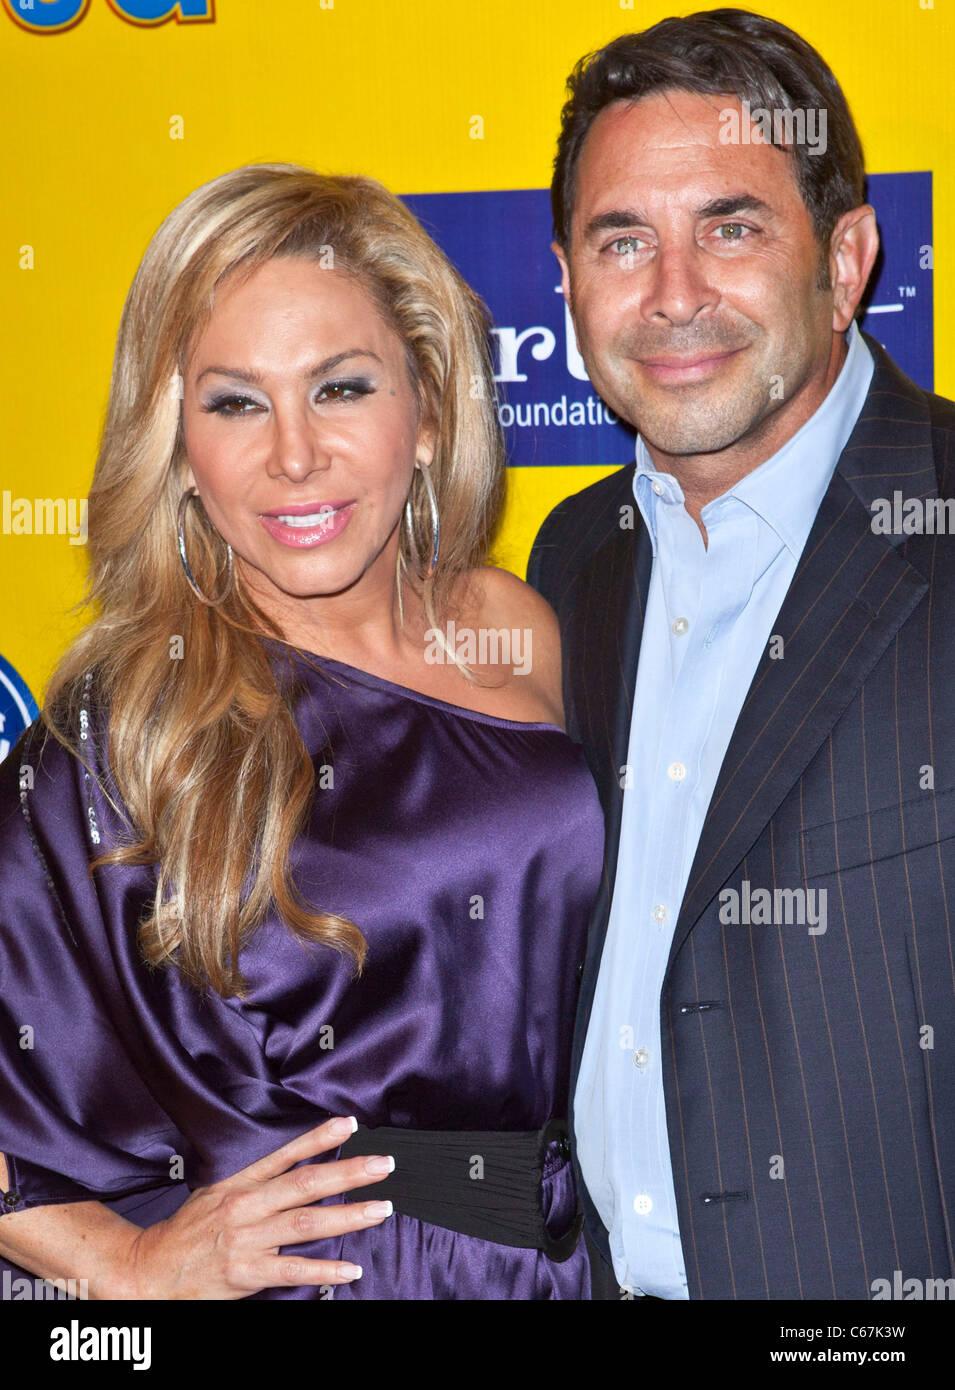 Adrienne Maloof, Paul Nassif in Anwesenheit für Ringling Bros & Barnum & Bailey Benefit Premiere der Stockbild